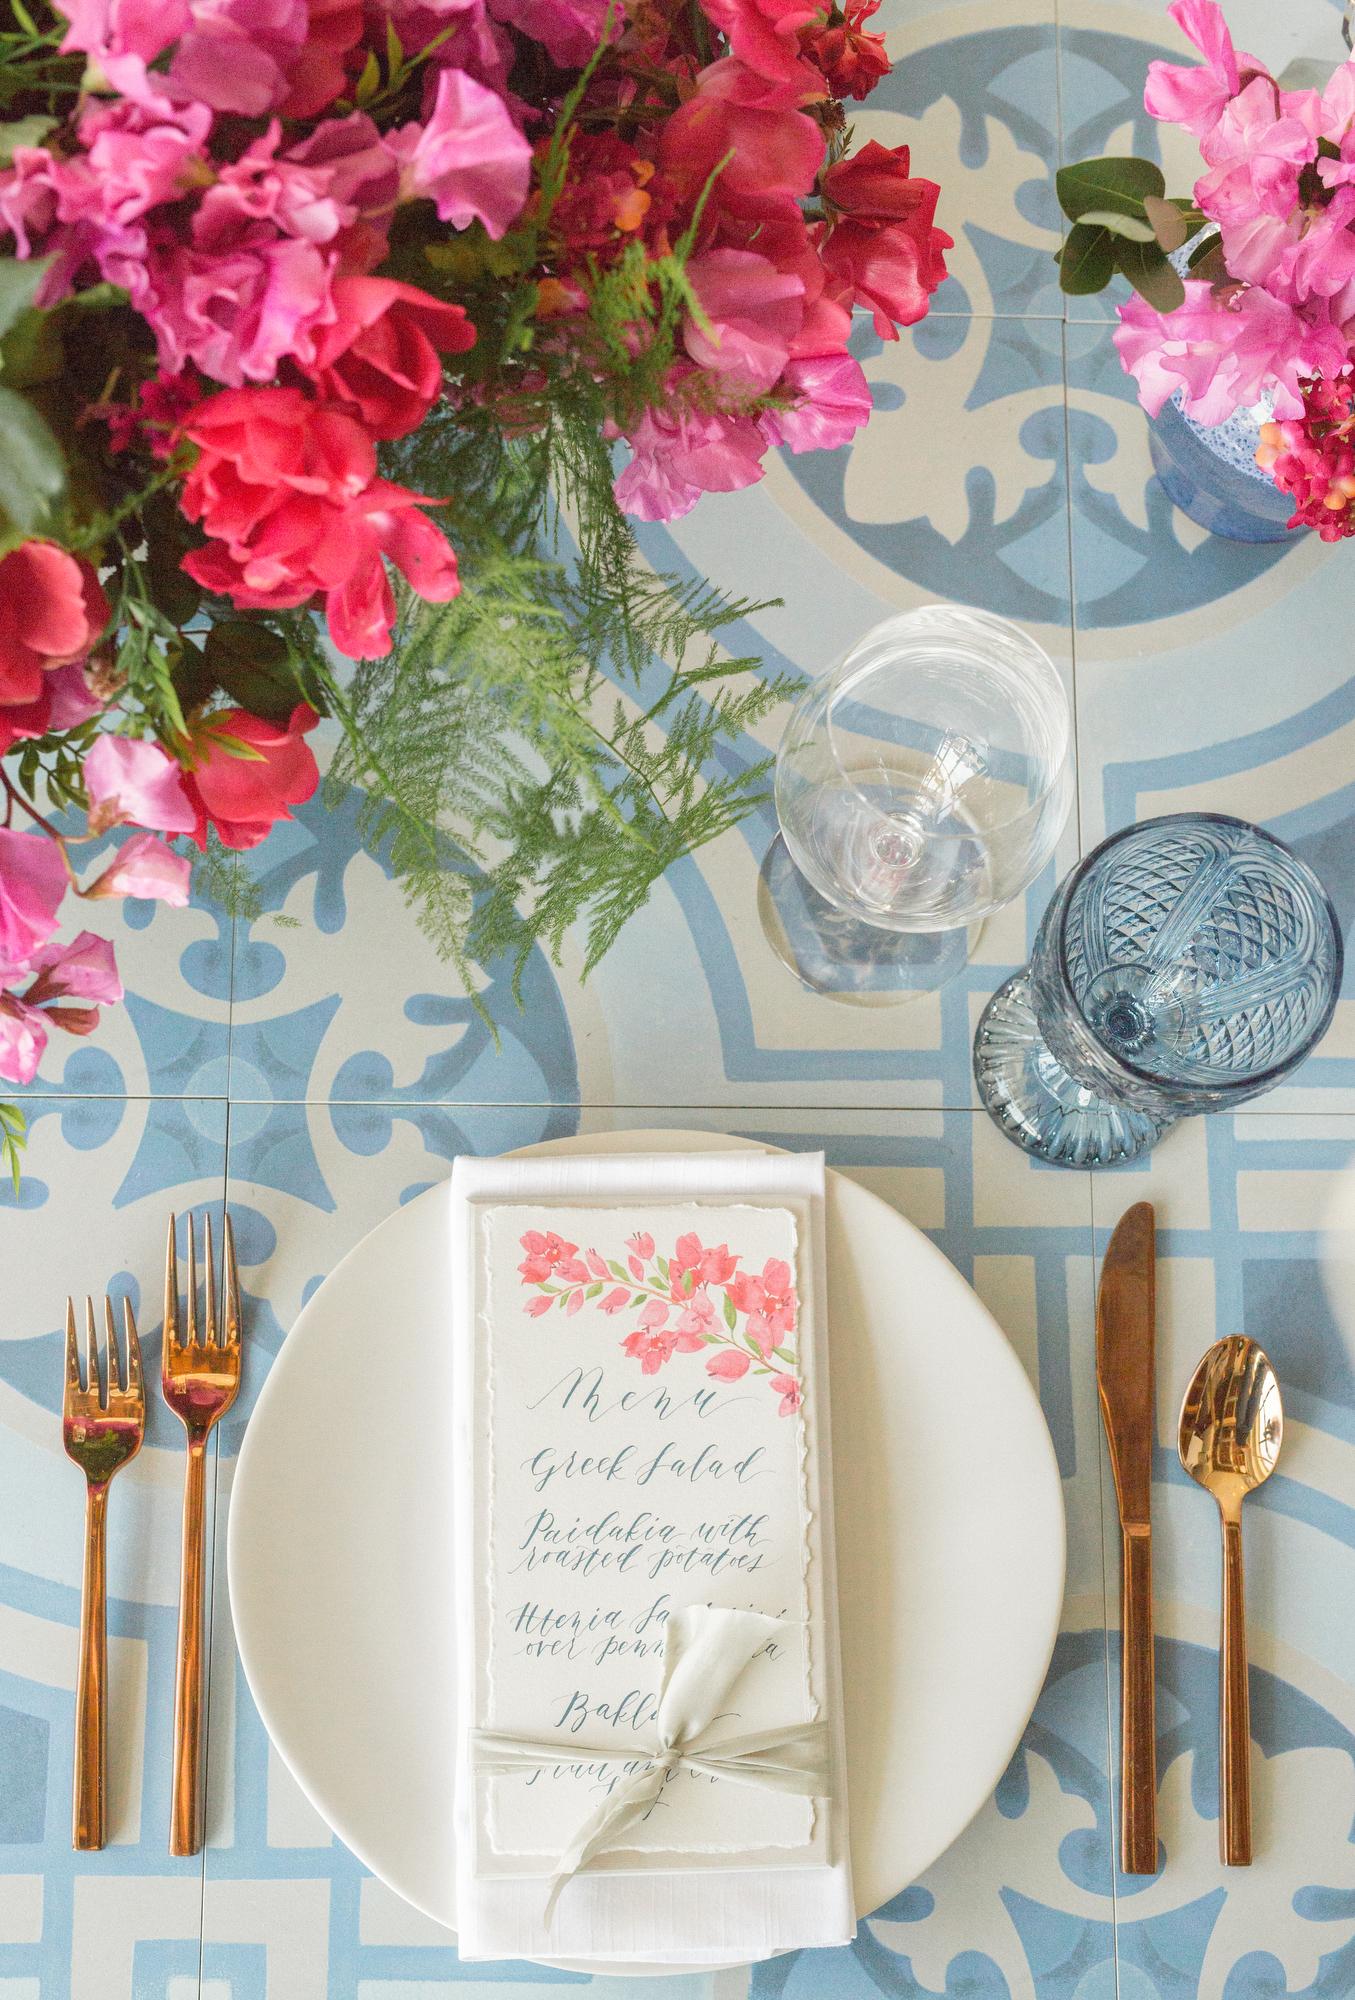 Something Blue Wedding Design | Santorini Wedding | Greece Inspired Design | Michelle Leo Events | Utah Event Planner and Designer | Britt Chudleigh Photography